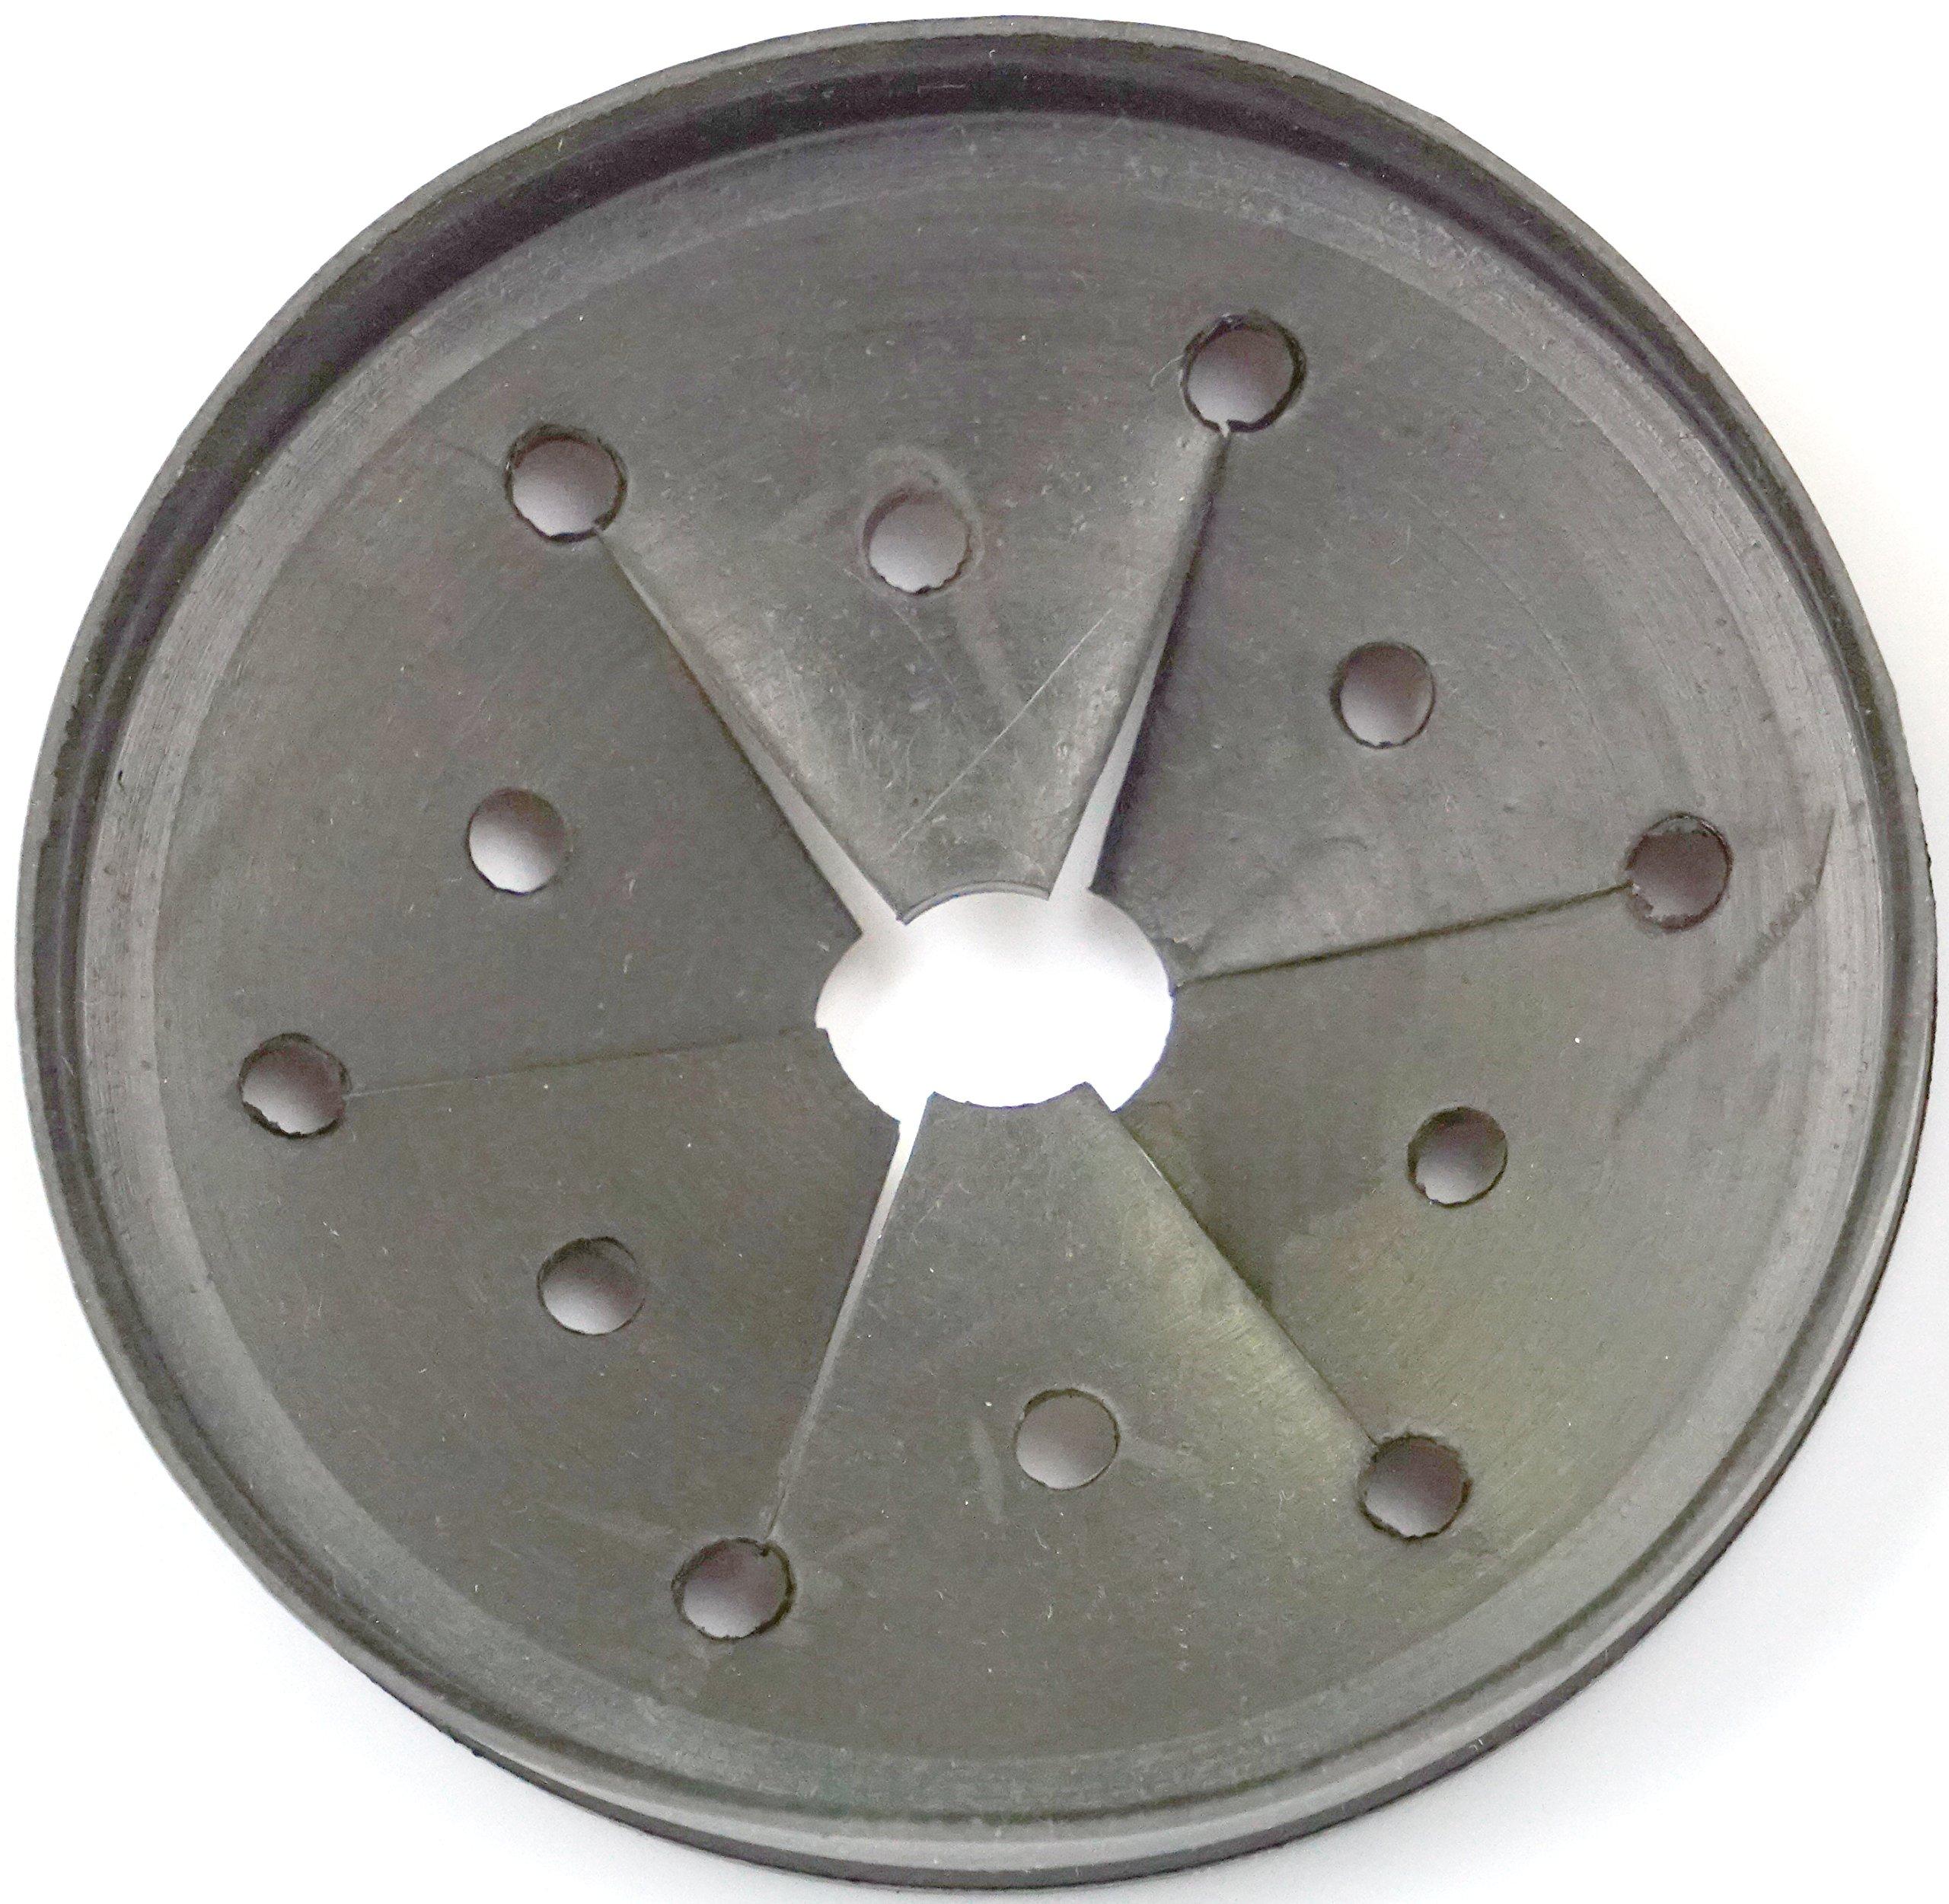 LASCO 39-9015 Replacement Rubber Snap on Splashguard for InSinkErator Garbage Disposal